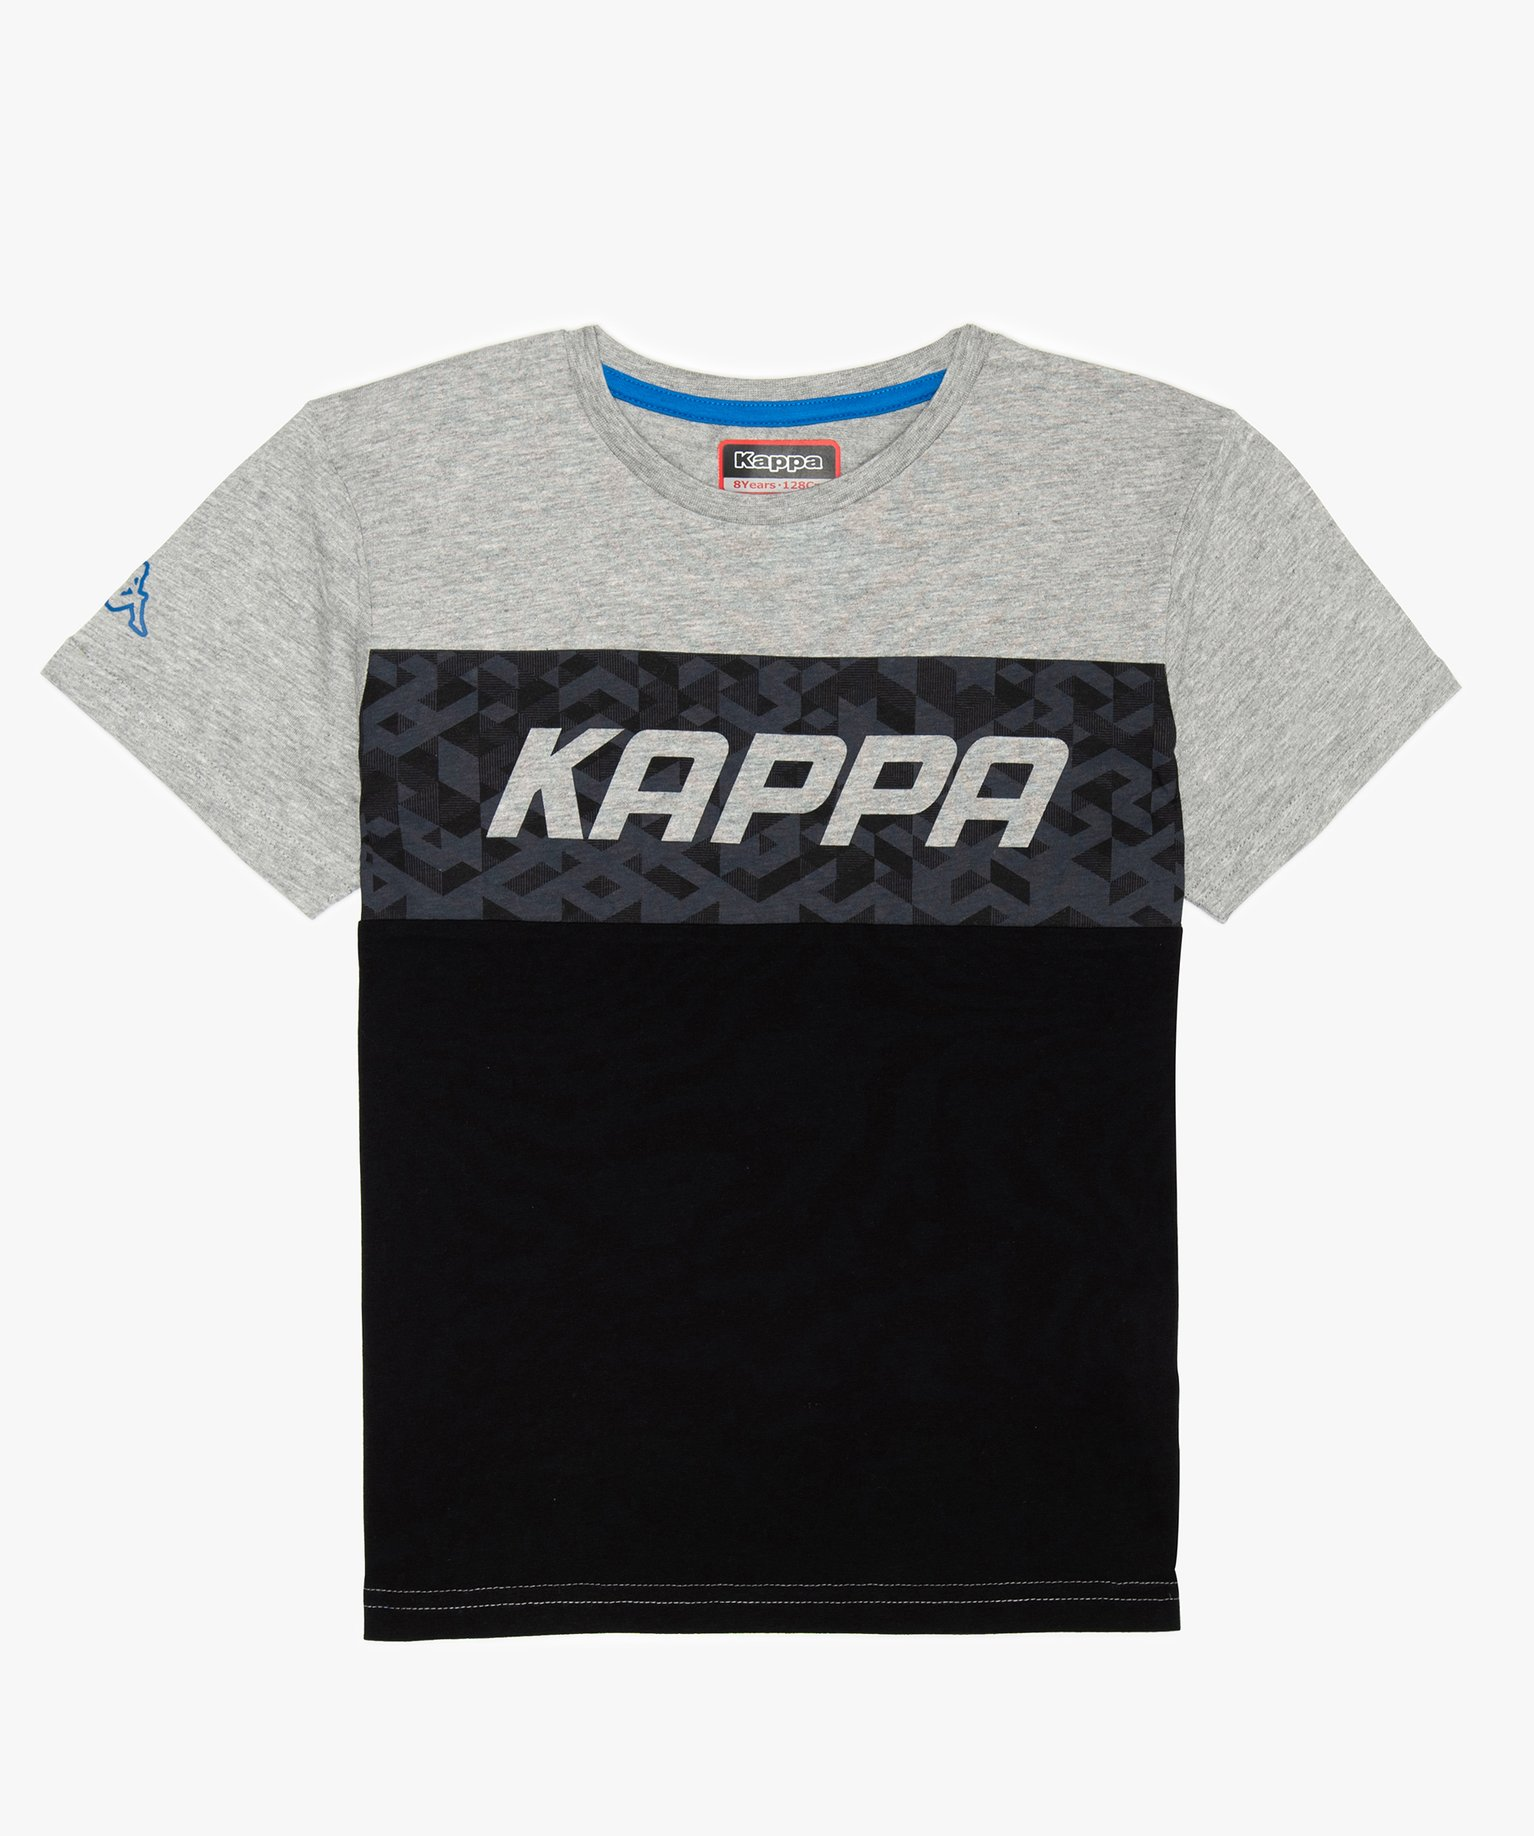 Tee-shirt garçon multicolore et imprimé - Kappa